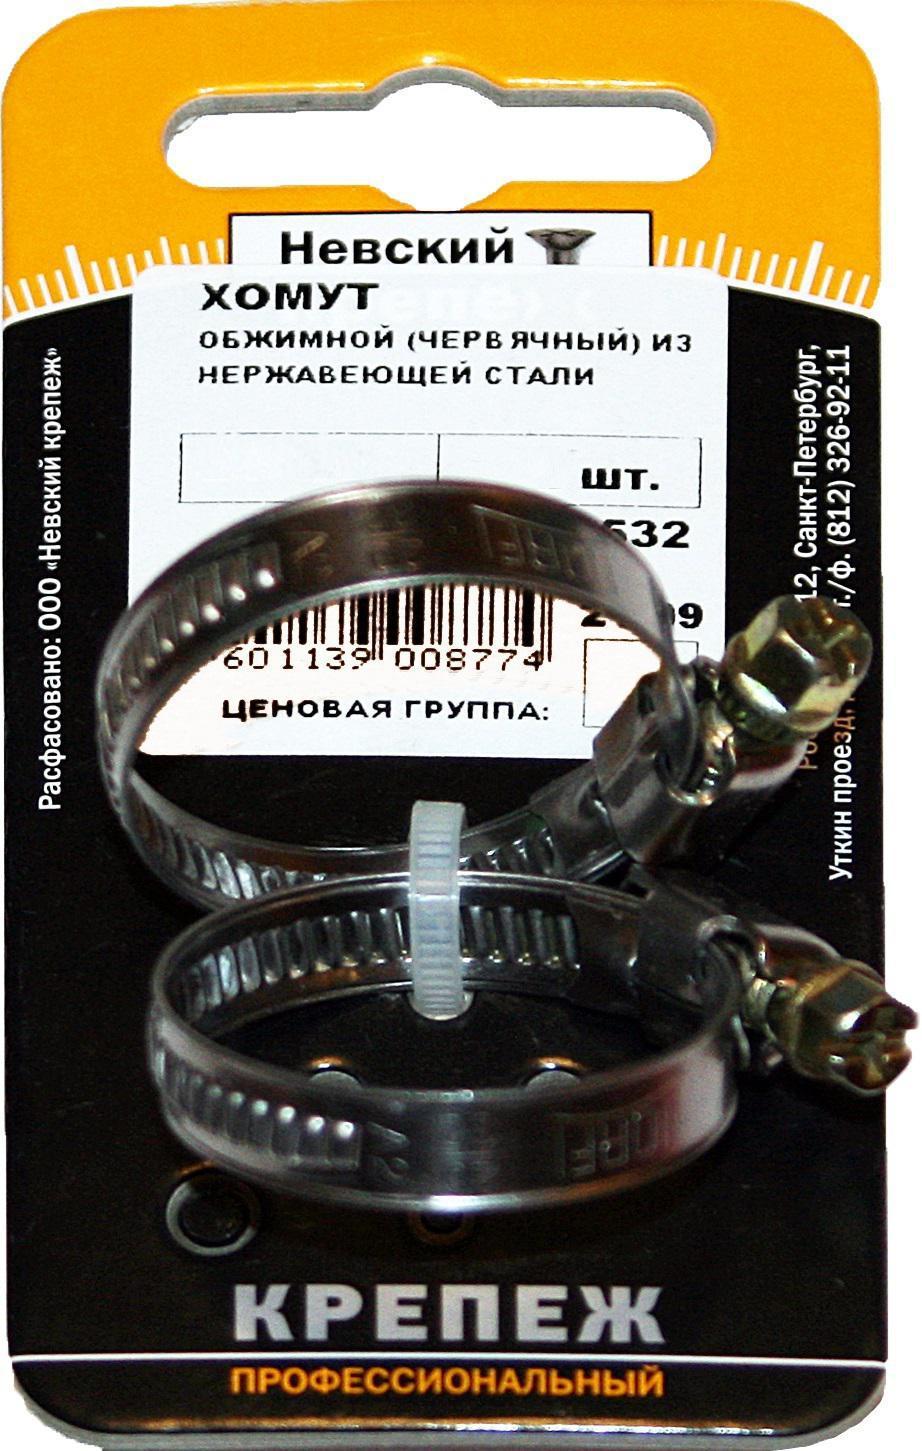 Хомут НЕВСКИЙ КРЕПЕЖ 800531